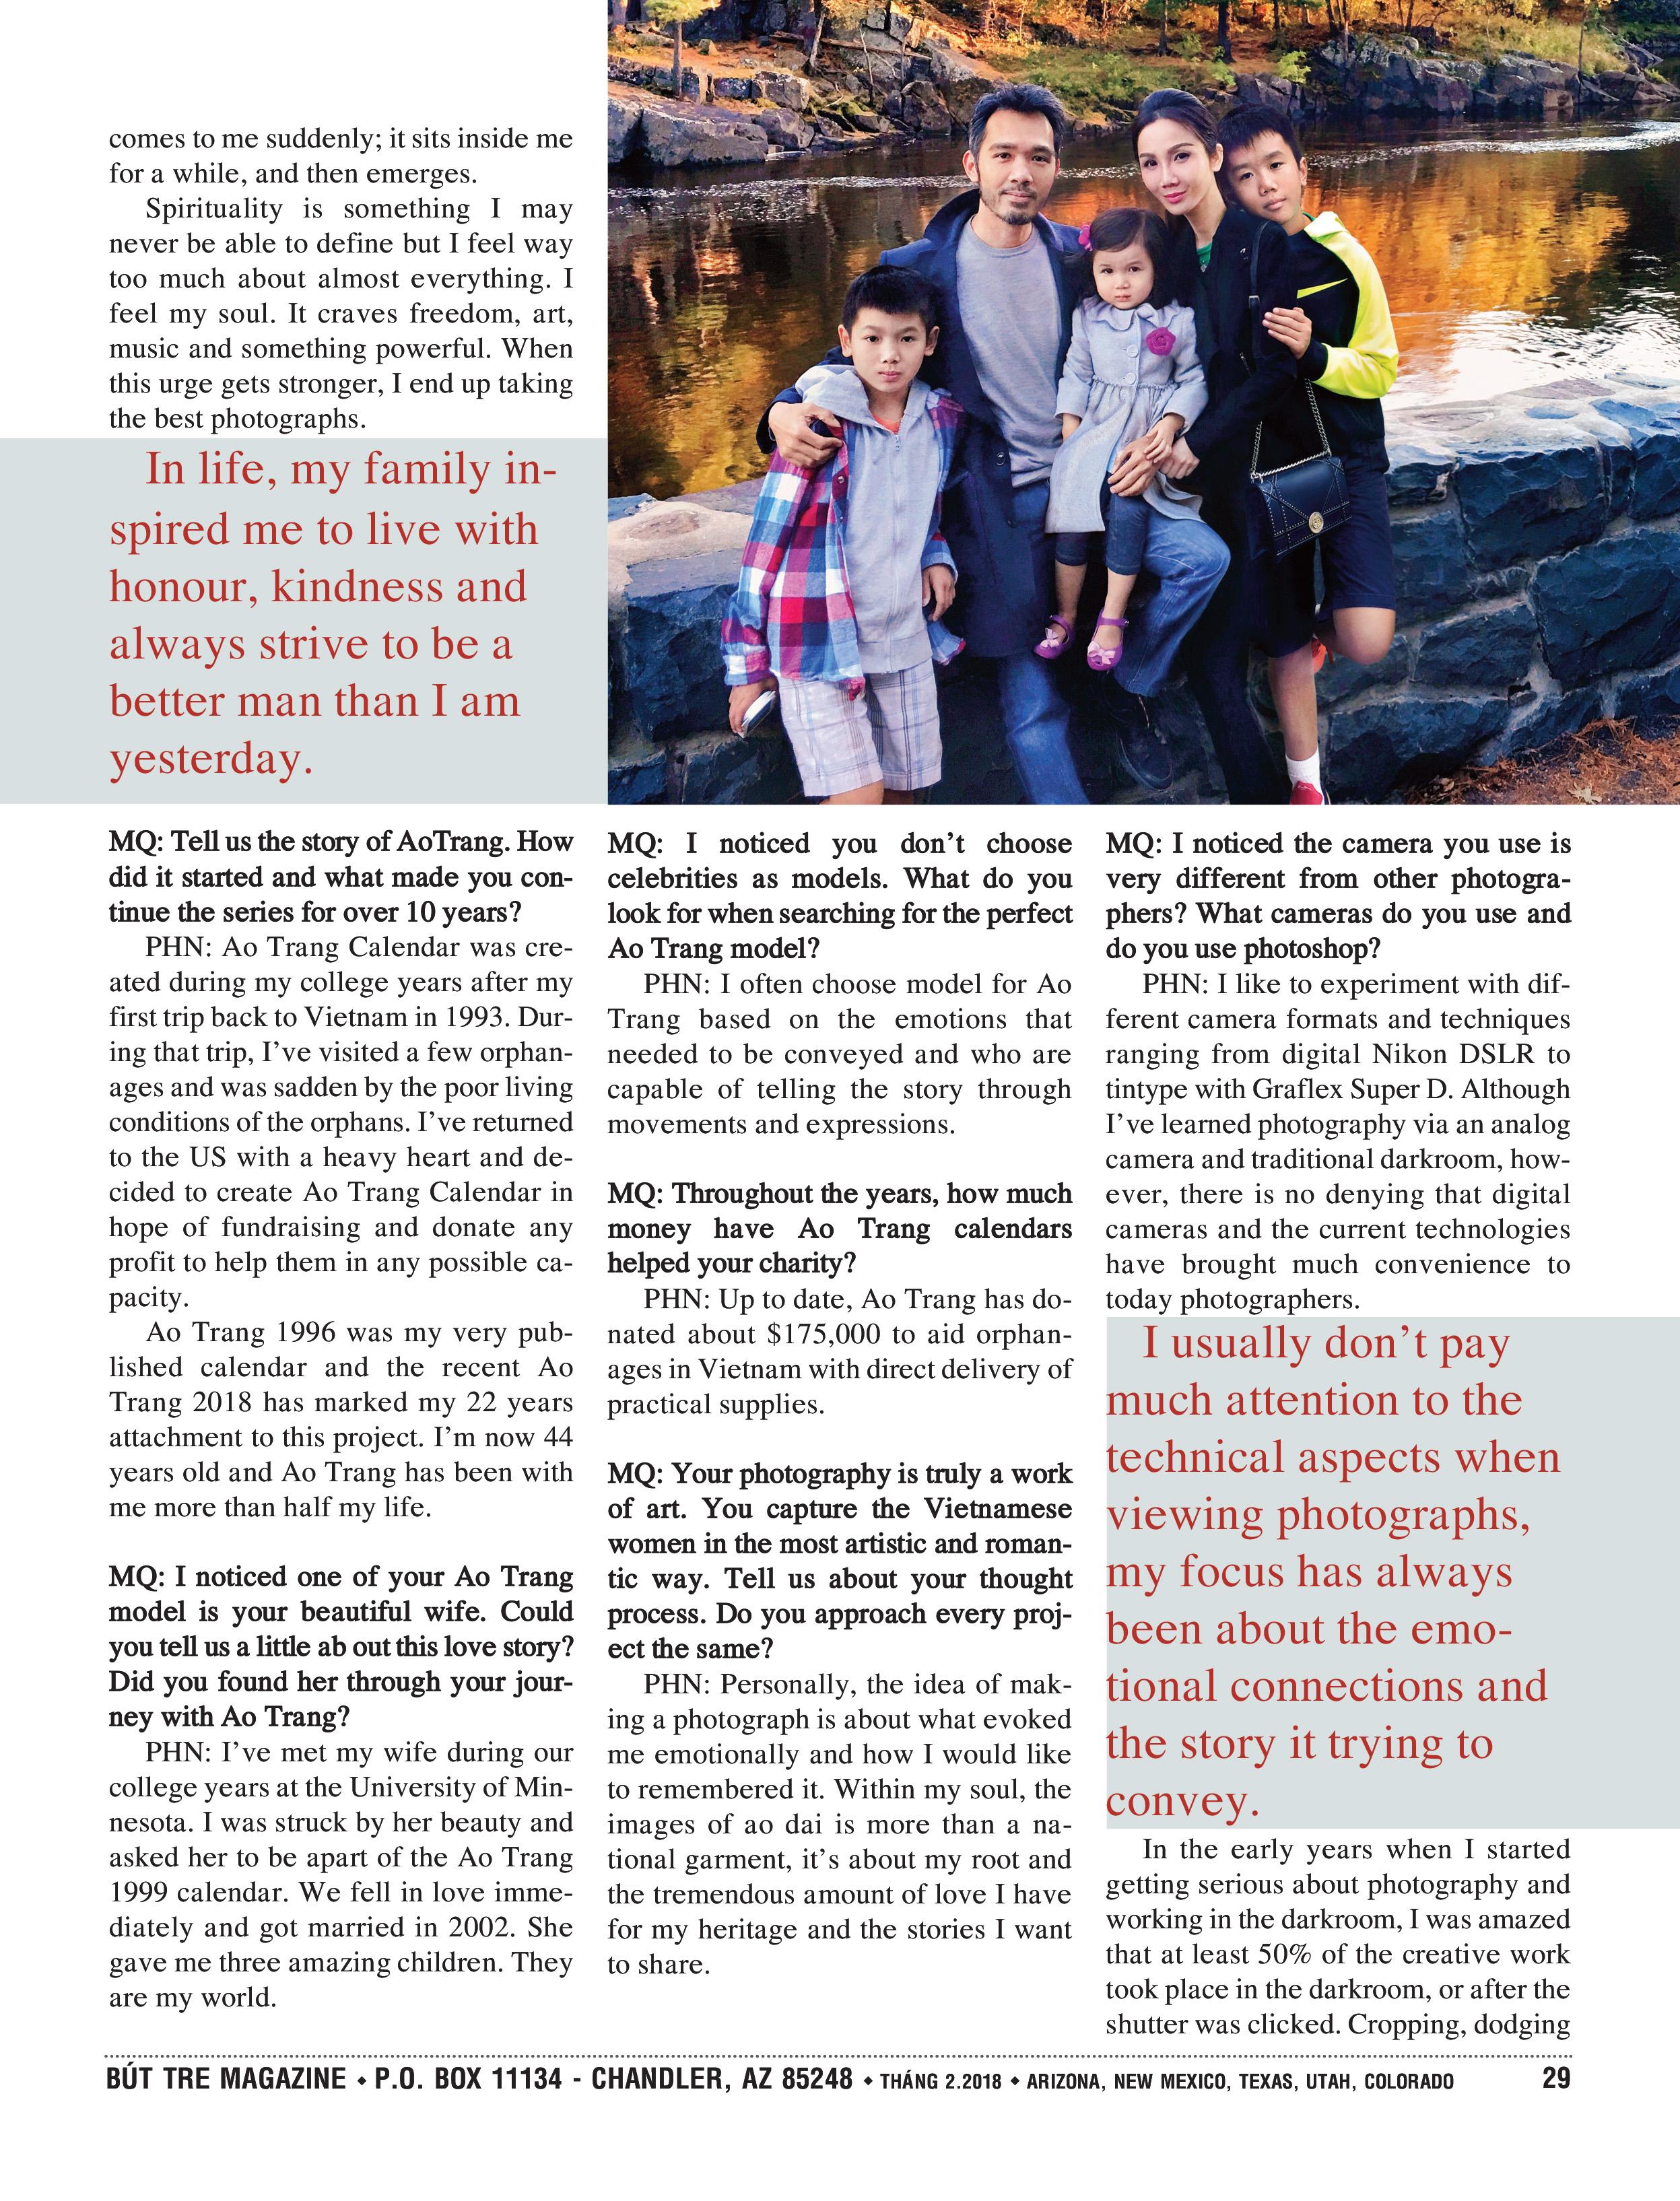 Pham-Hoai-Nam-But-Tre-Interview March 2018-3.jpg